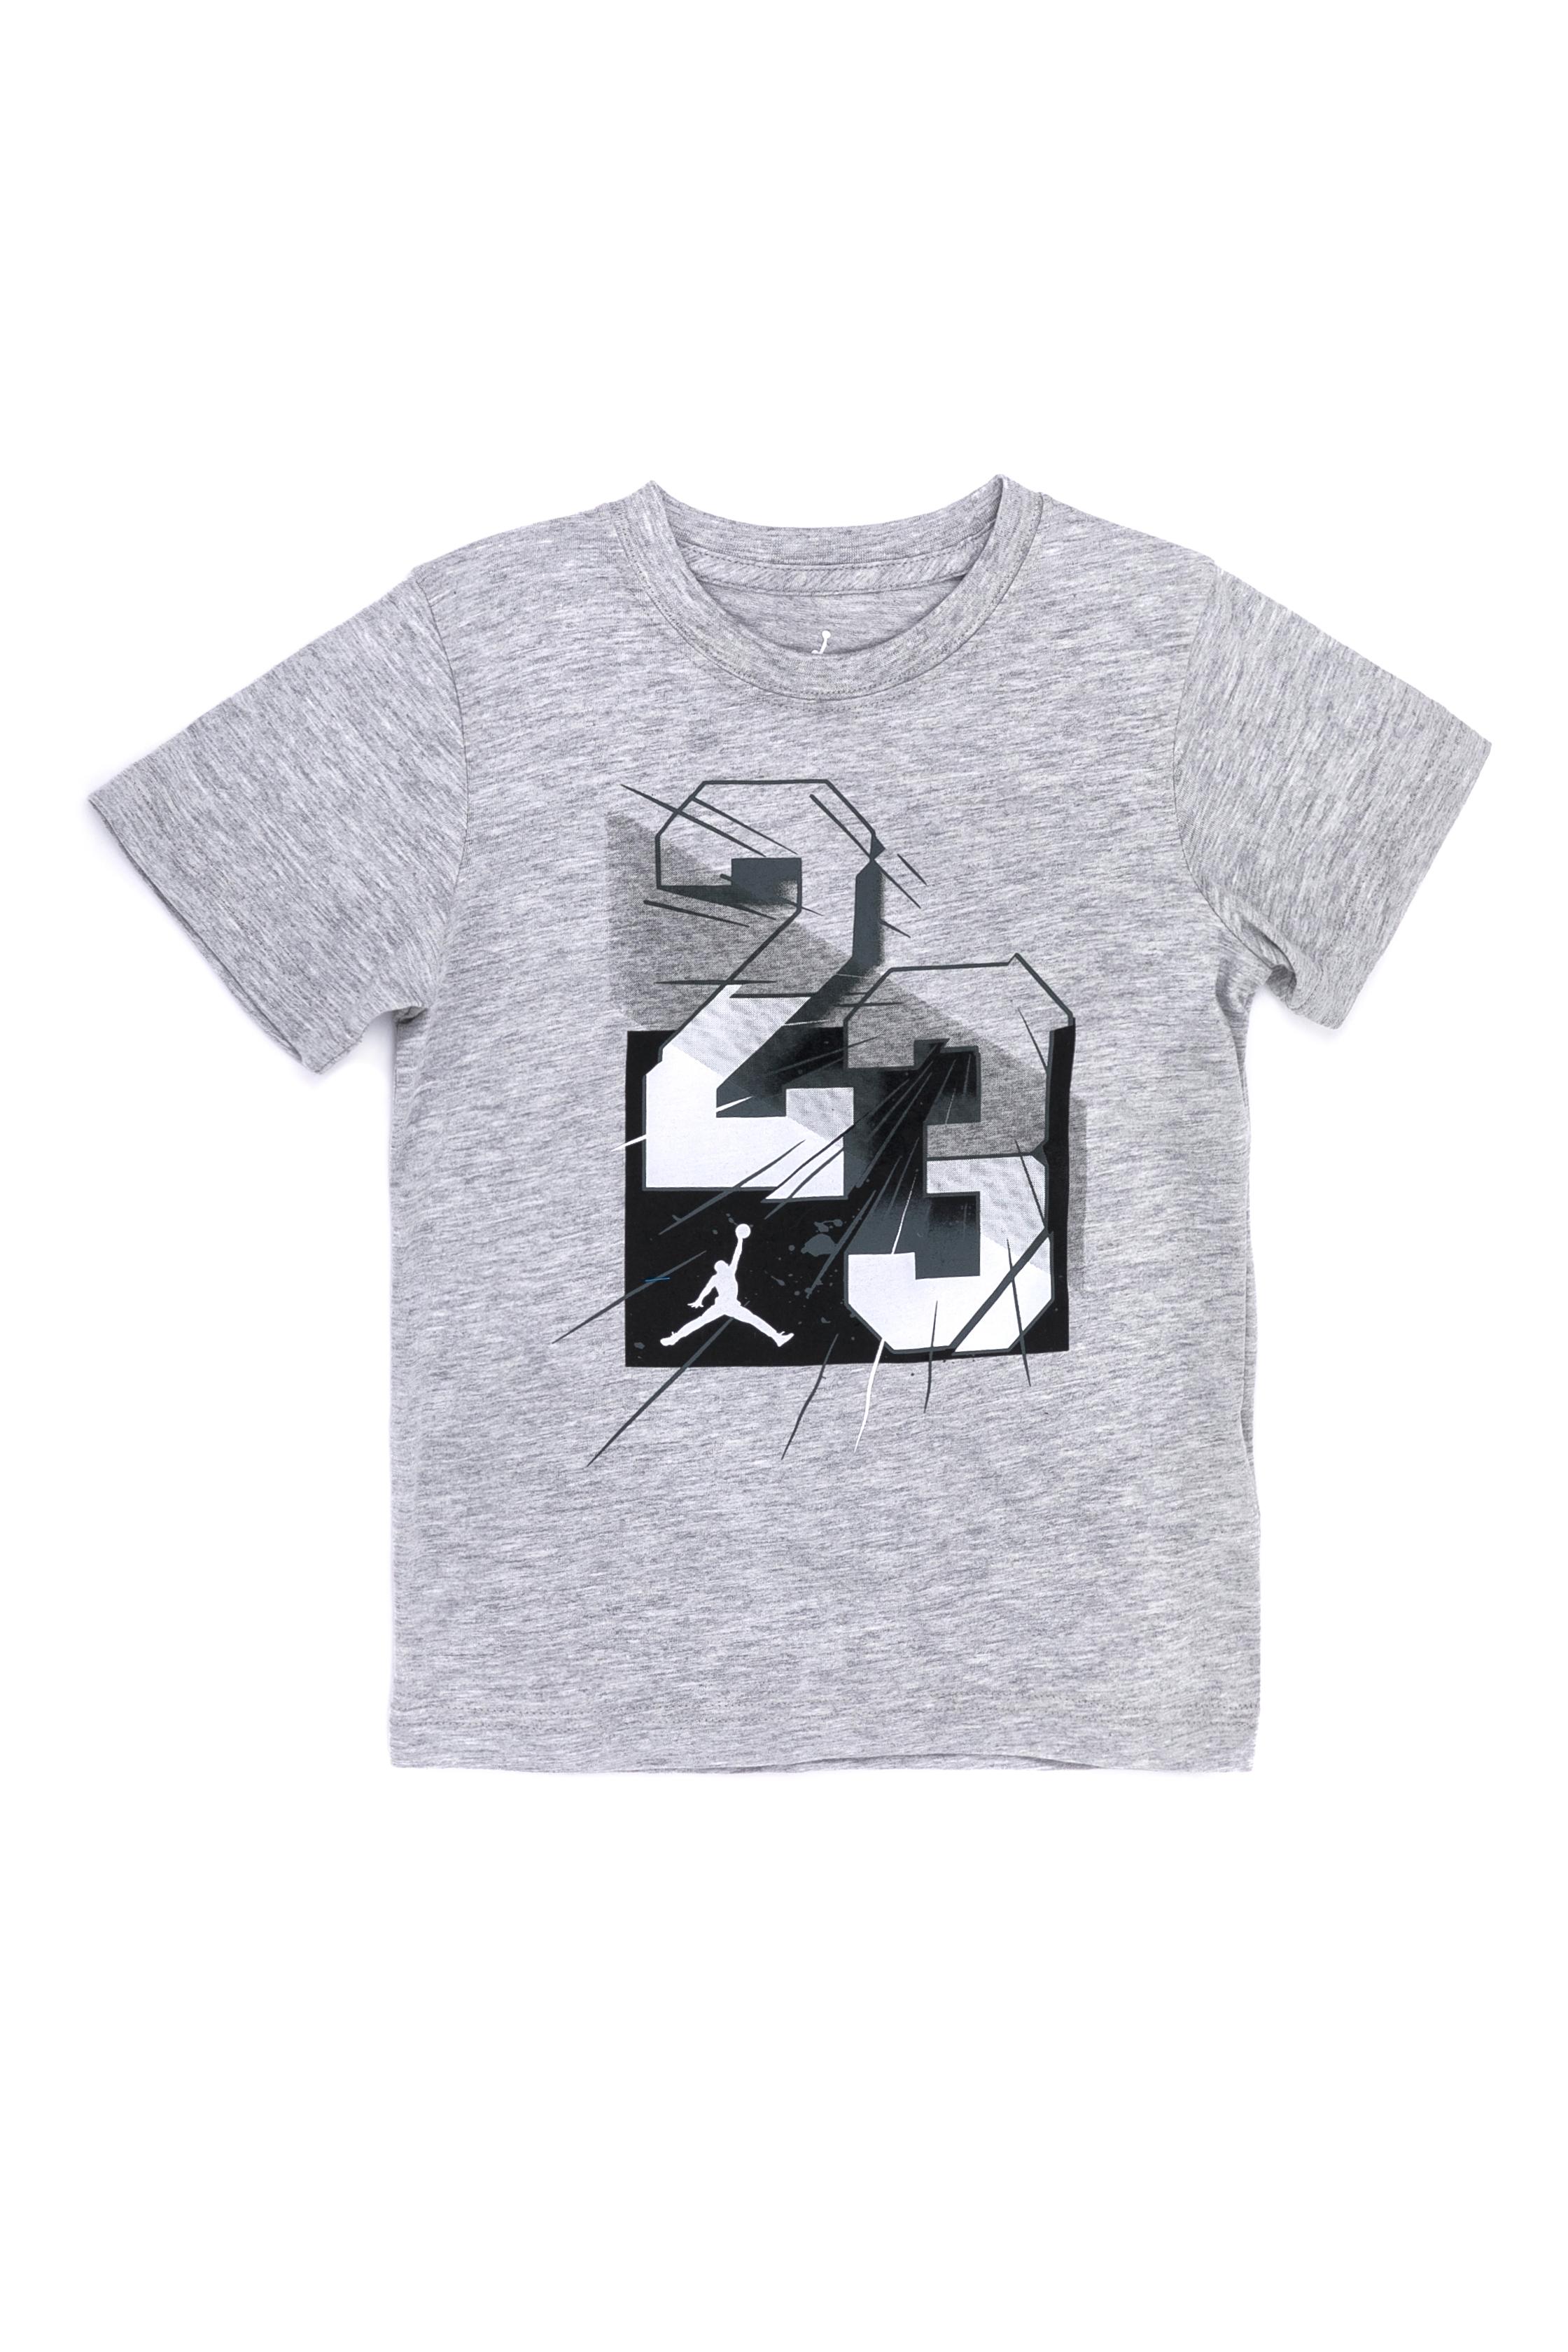 NIKE – Παιδική μπλούζα ΝΙΚΕ γκρι